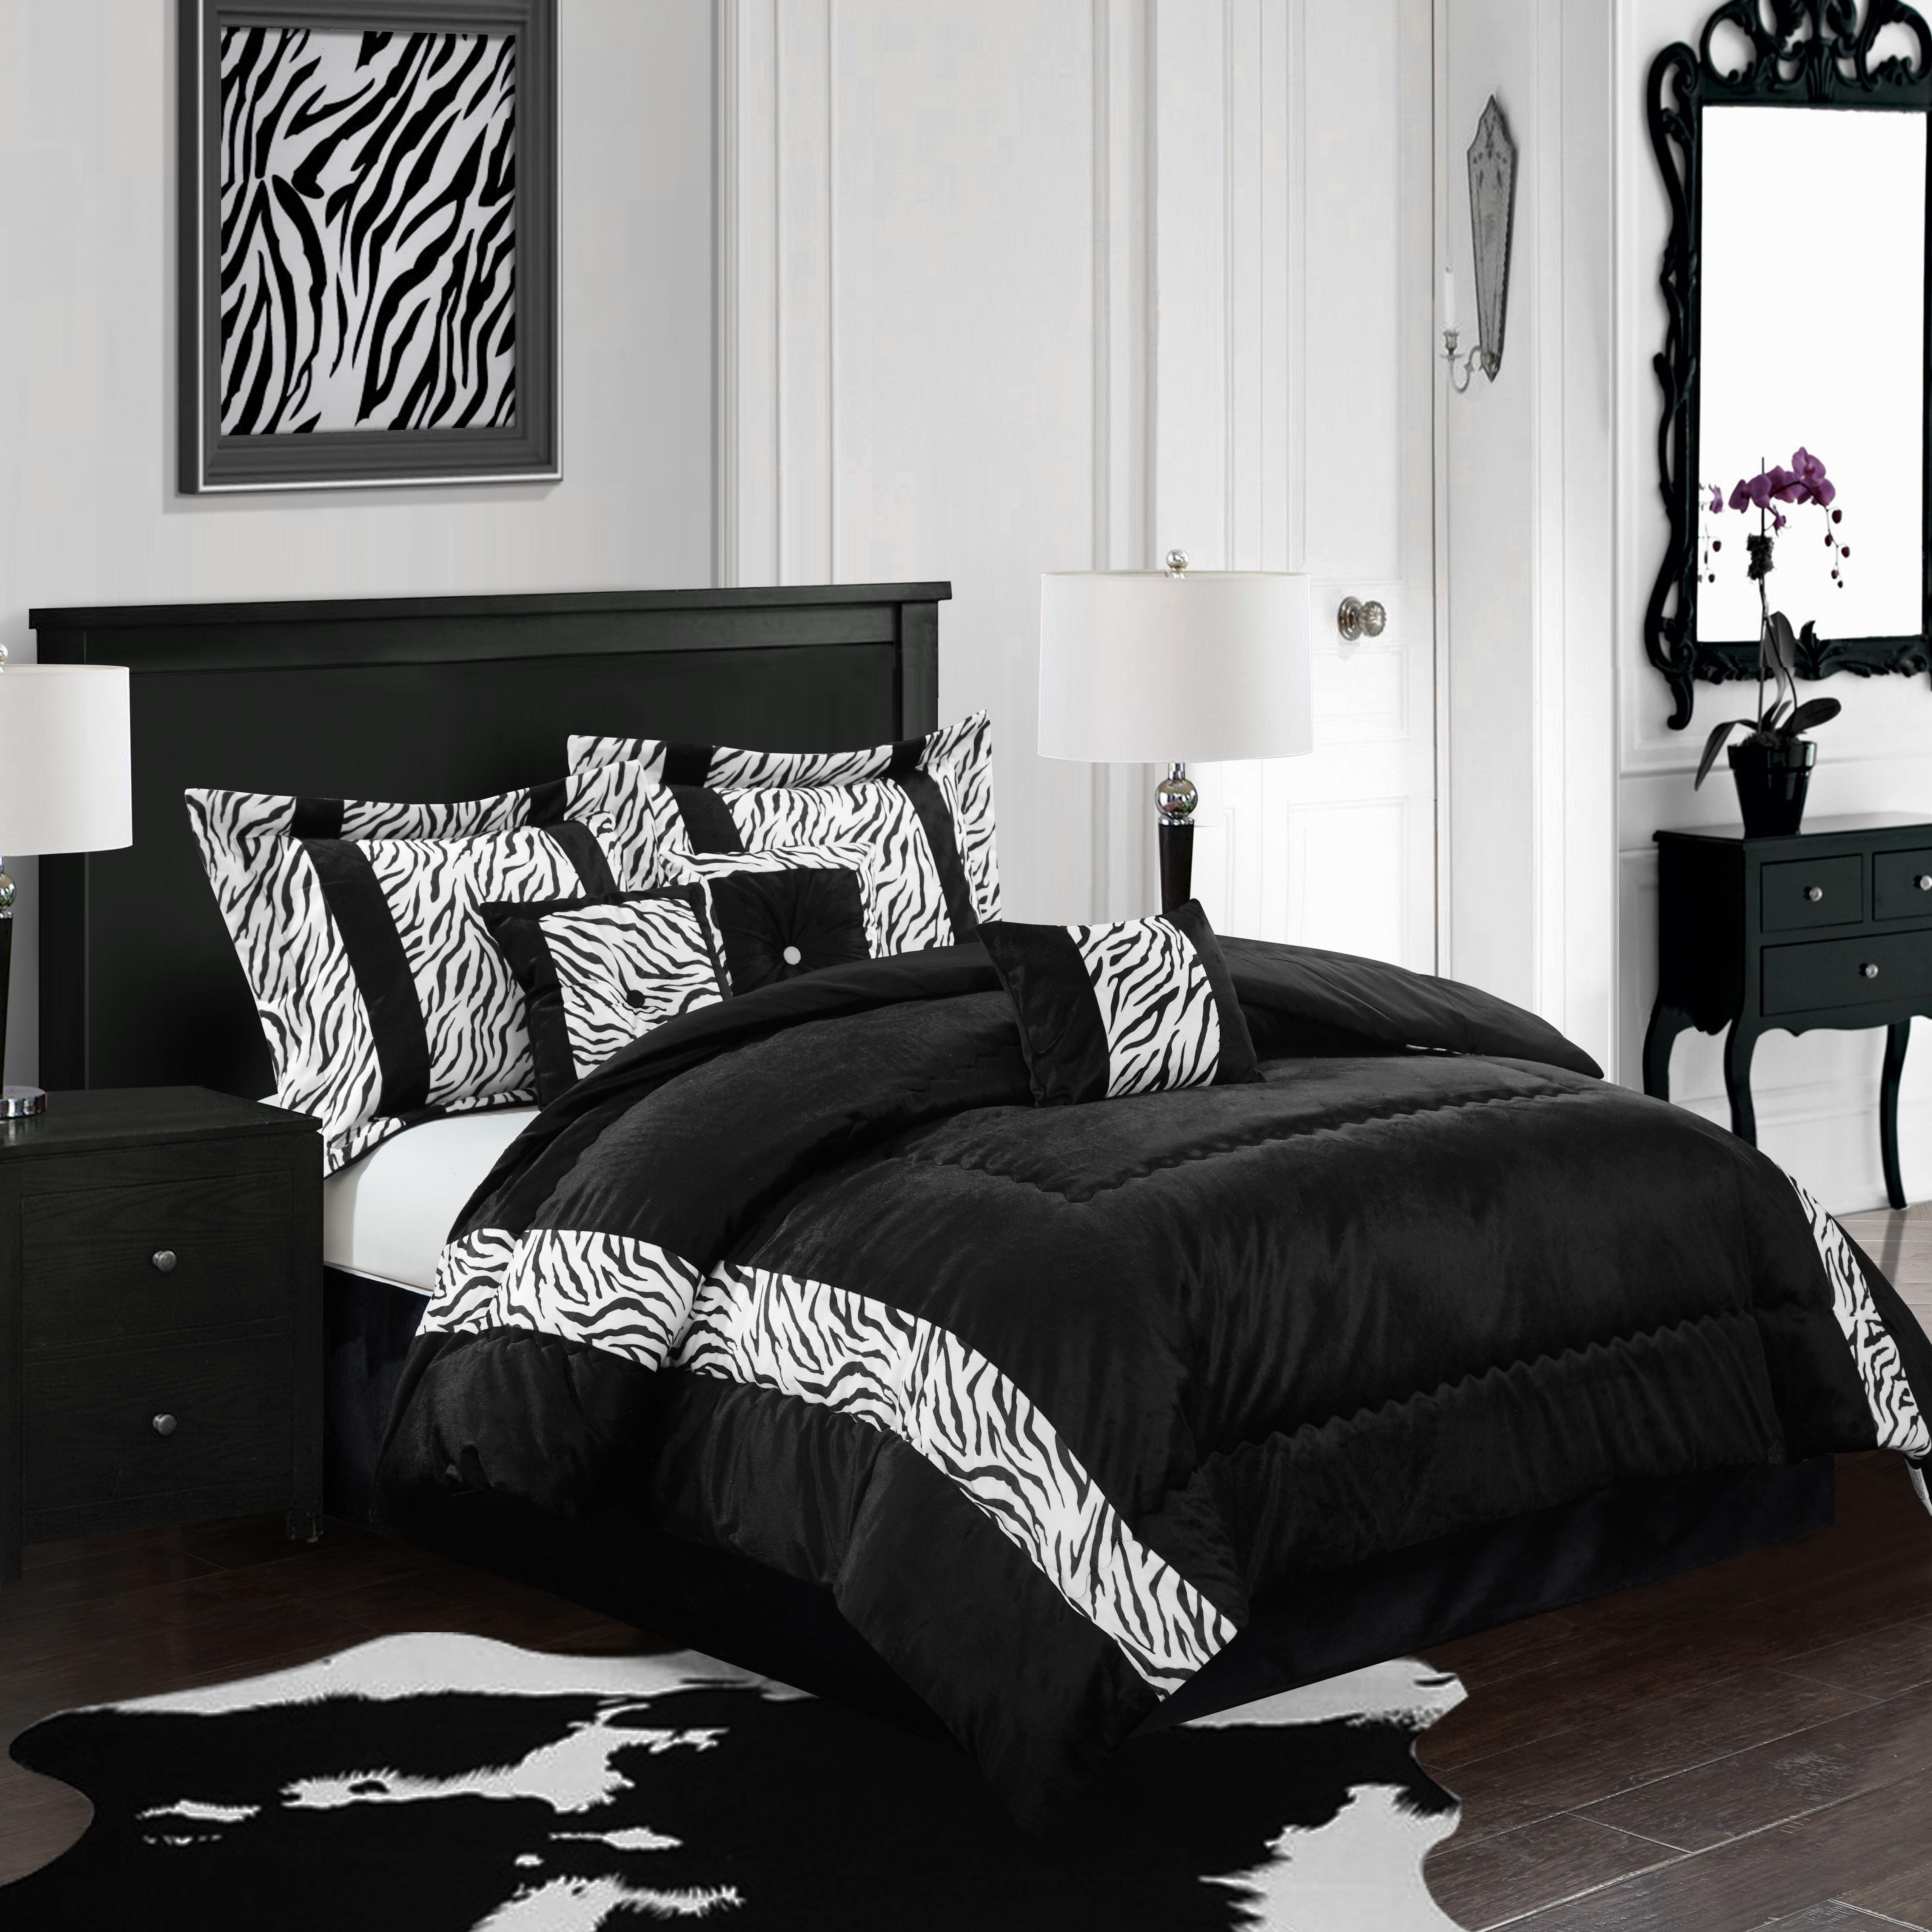 Mali 7-Piece Bedding Comforter Set, Black and White